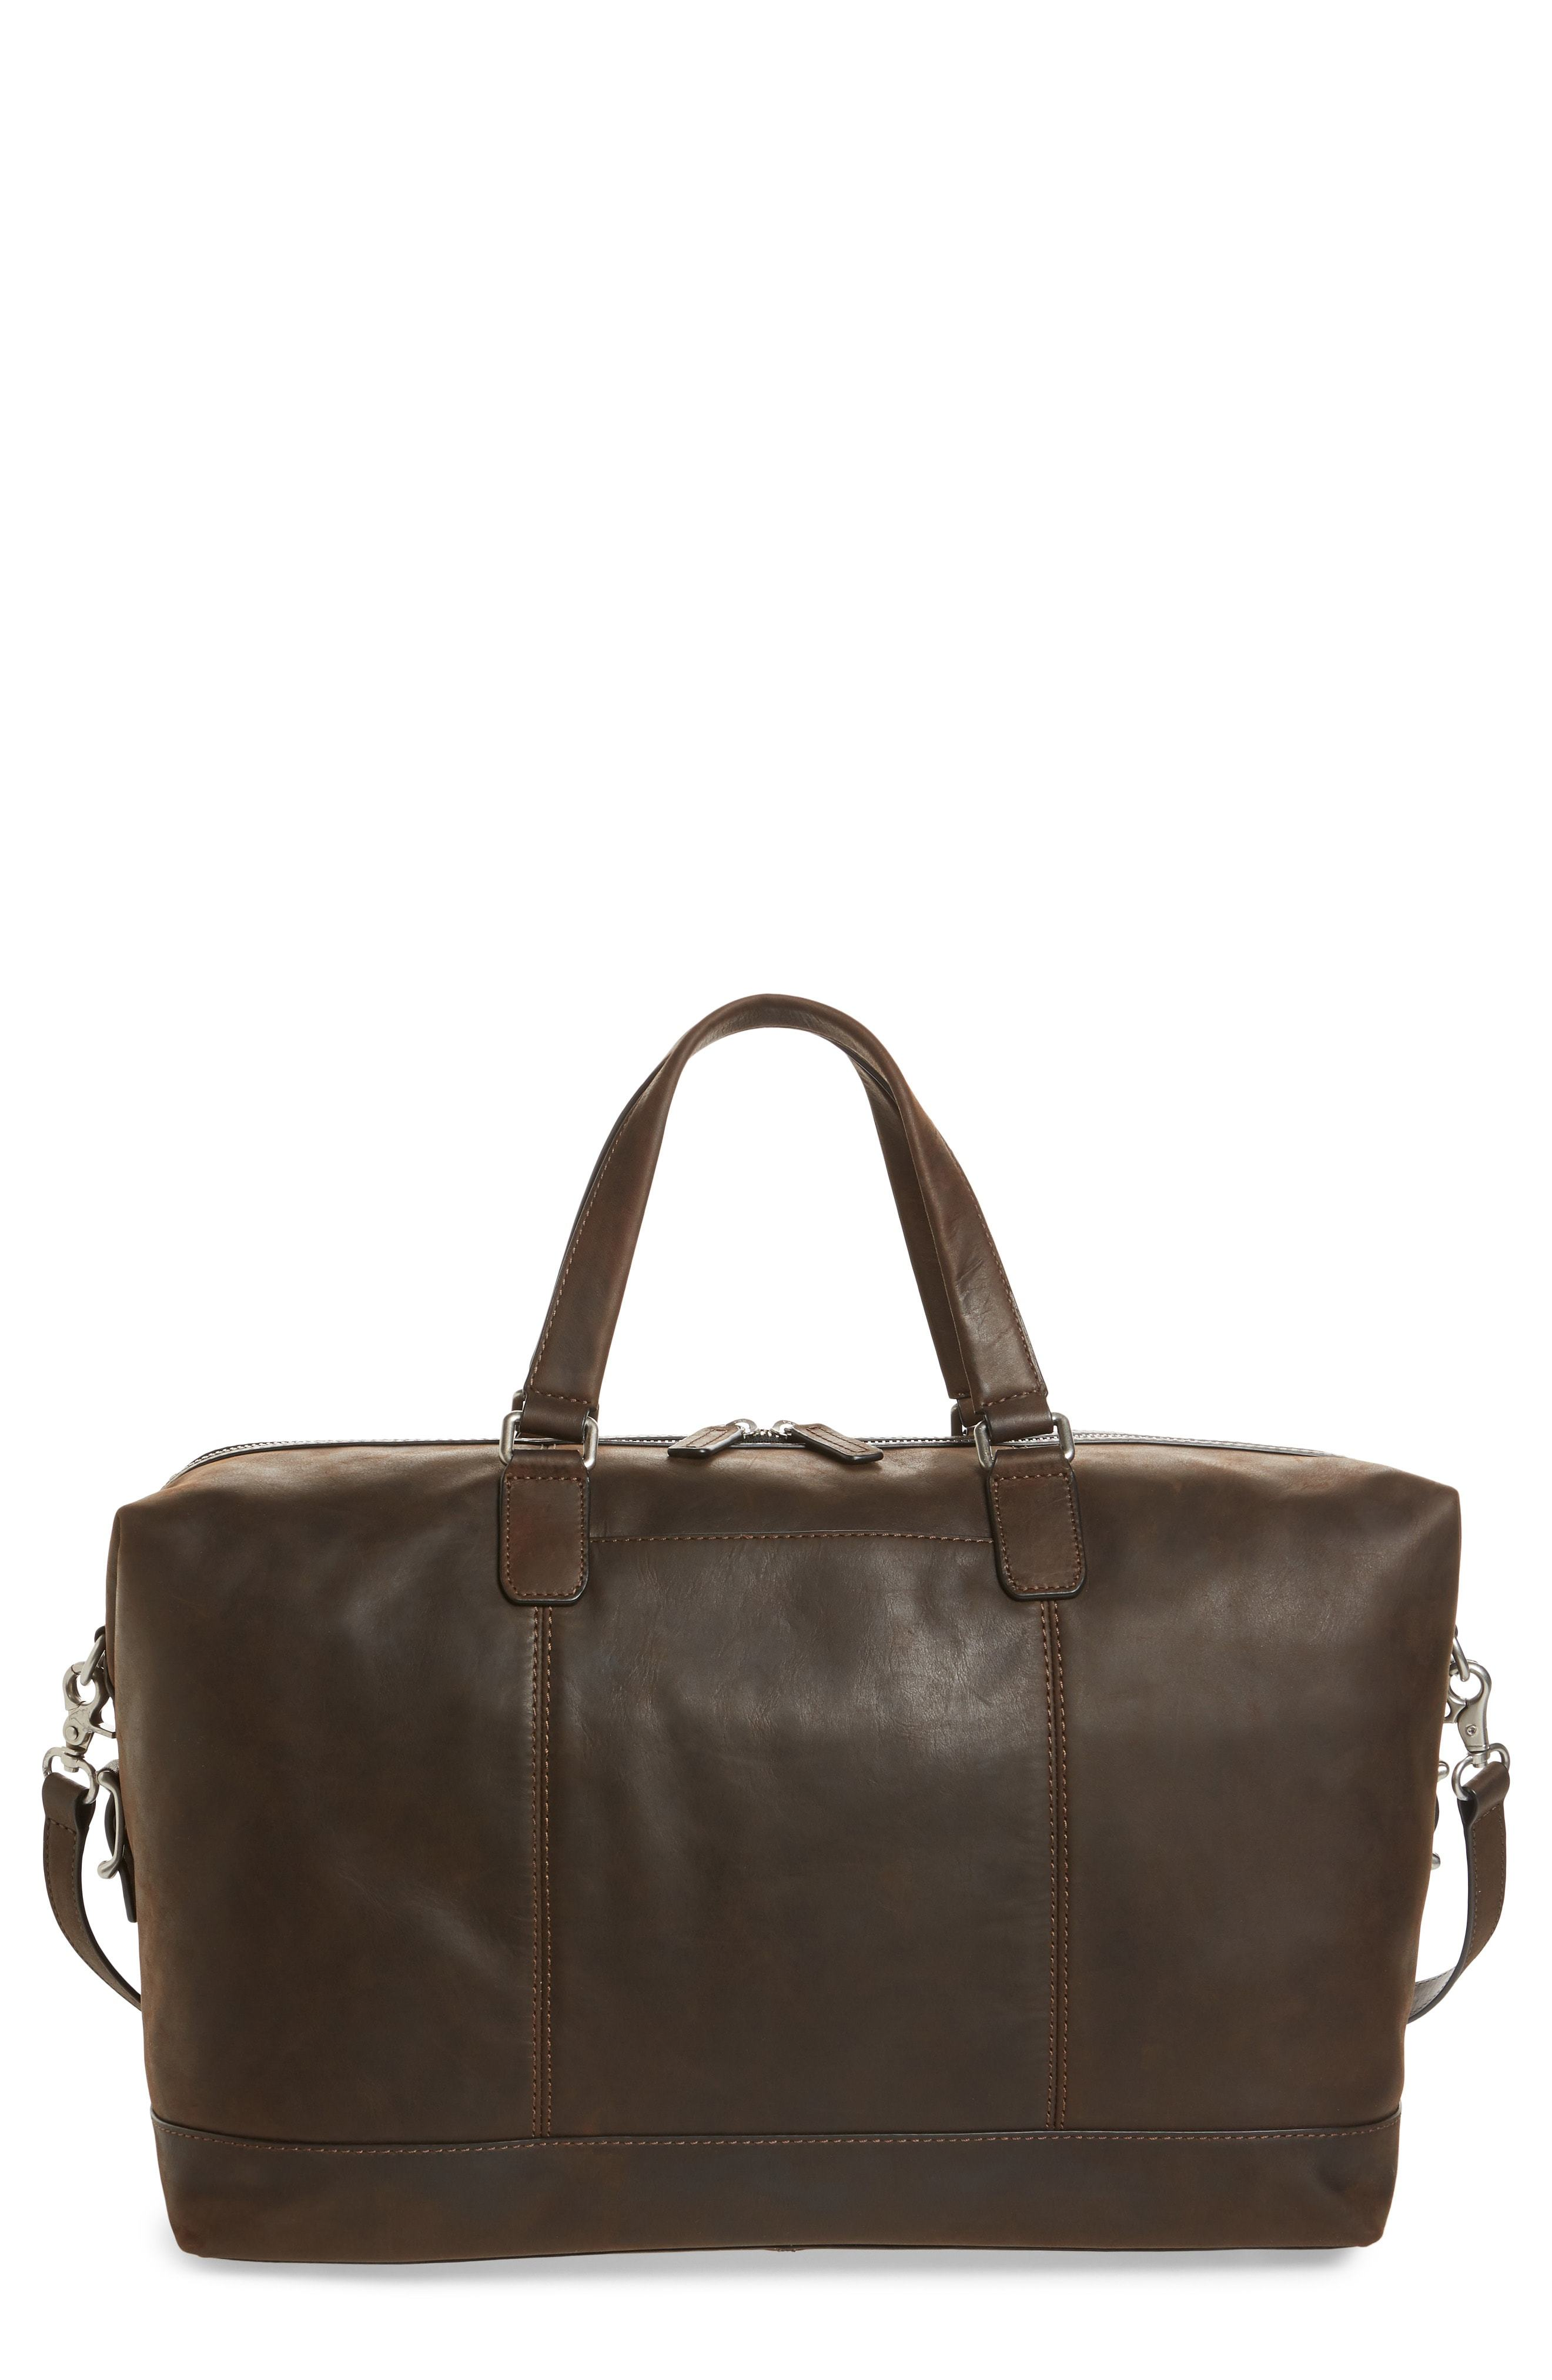 fca64b479 Frye Oliver Duffel Bag, $598   Nordstrom   Lookastic.com